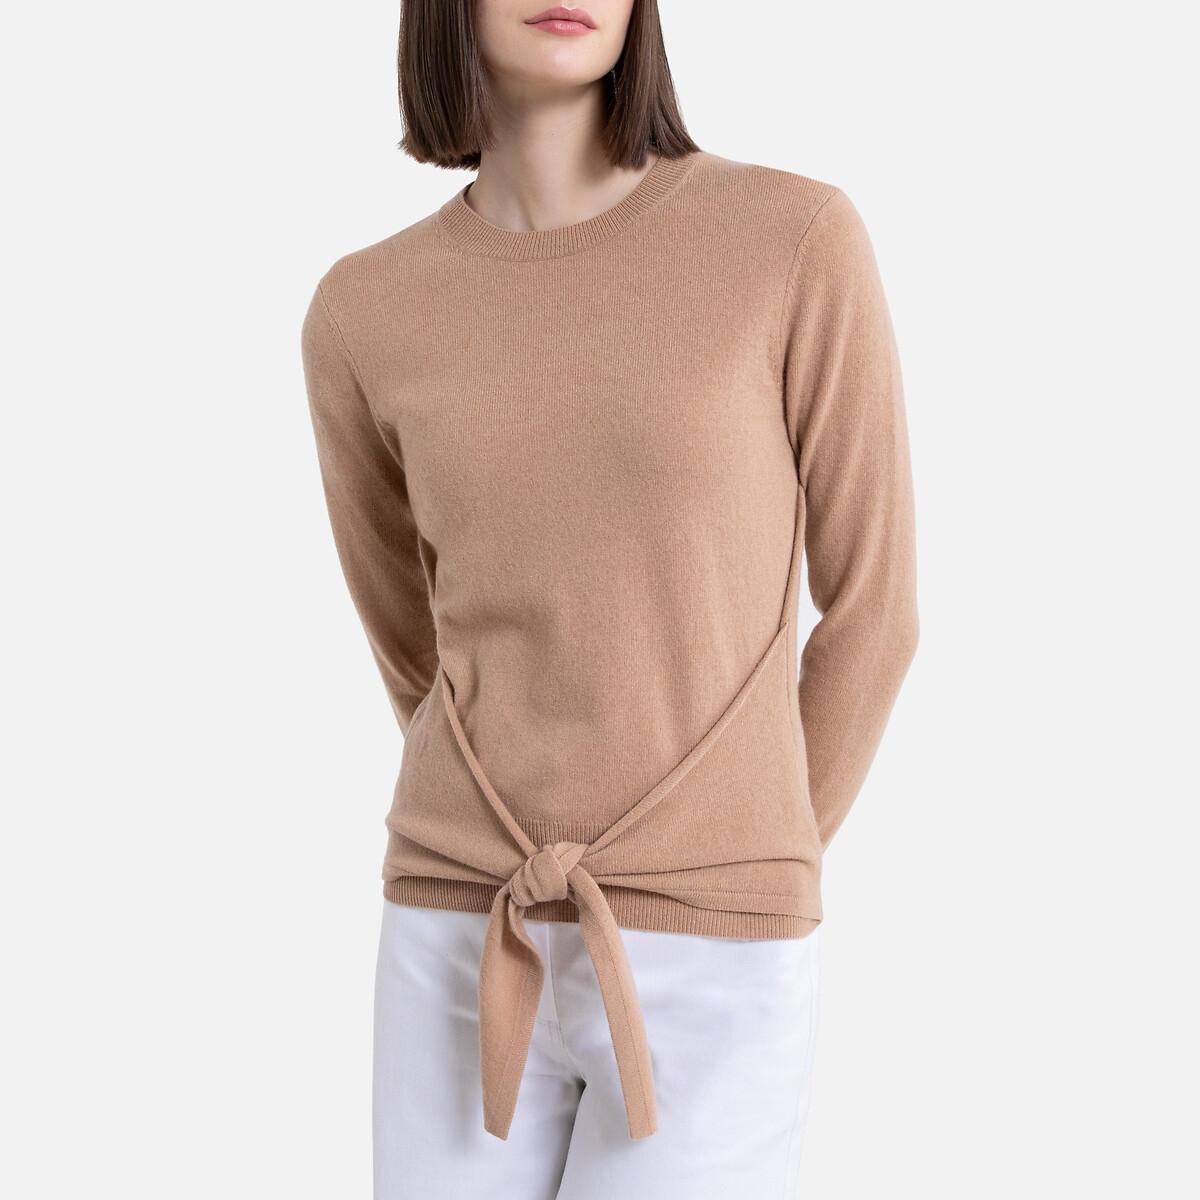 Пуловер La Redoute Из преобладания шерсти и кашемира L бежевый